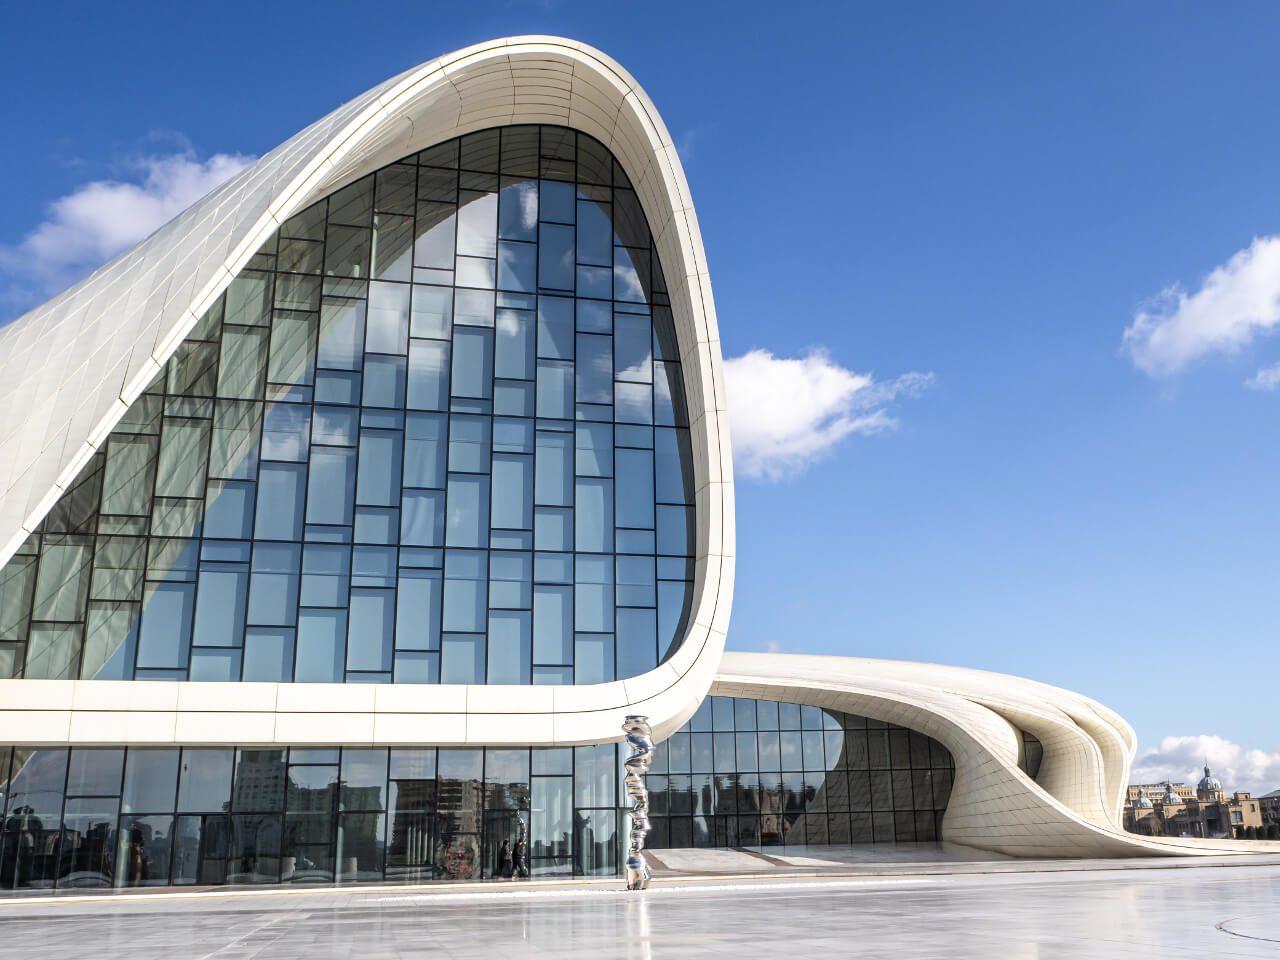 Wejście Centrum Heydara Aliyeva Baku